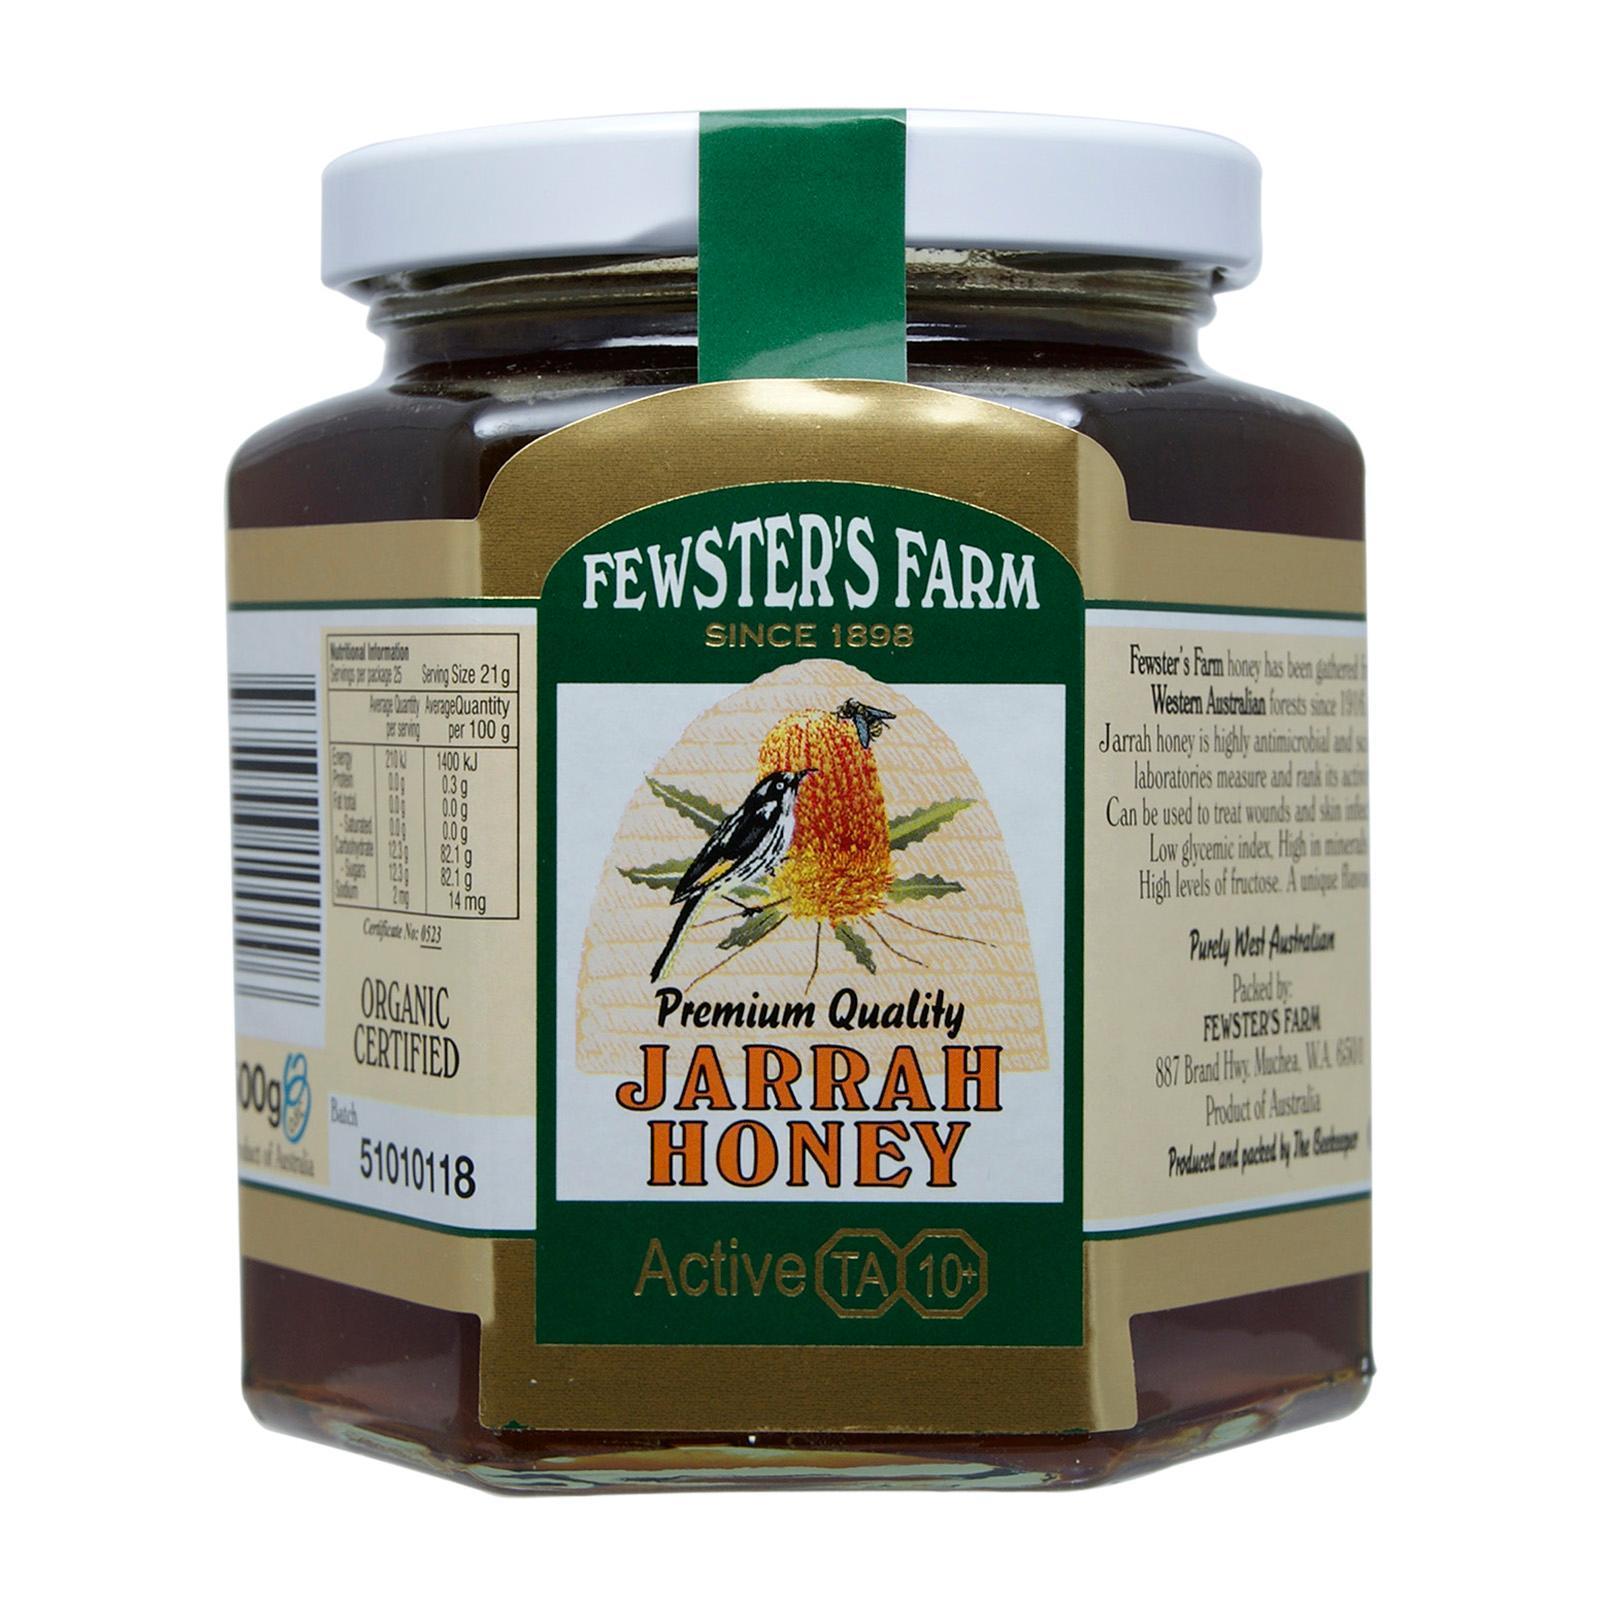 Fewster's Farm TA 10+ Jarrah Honey Honey - By Nature's Nutrition